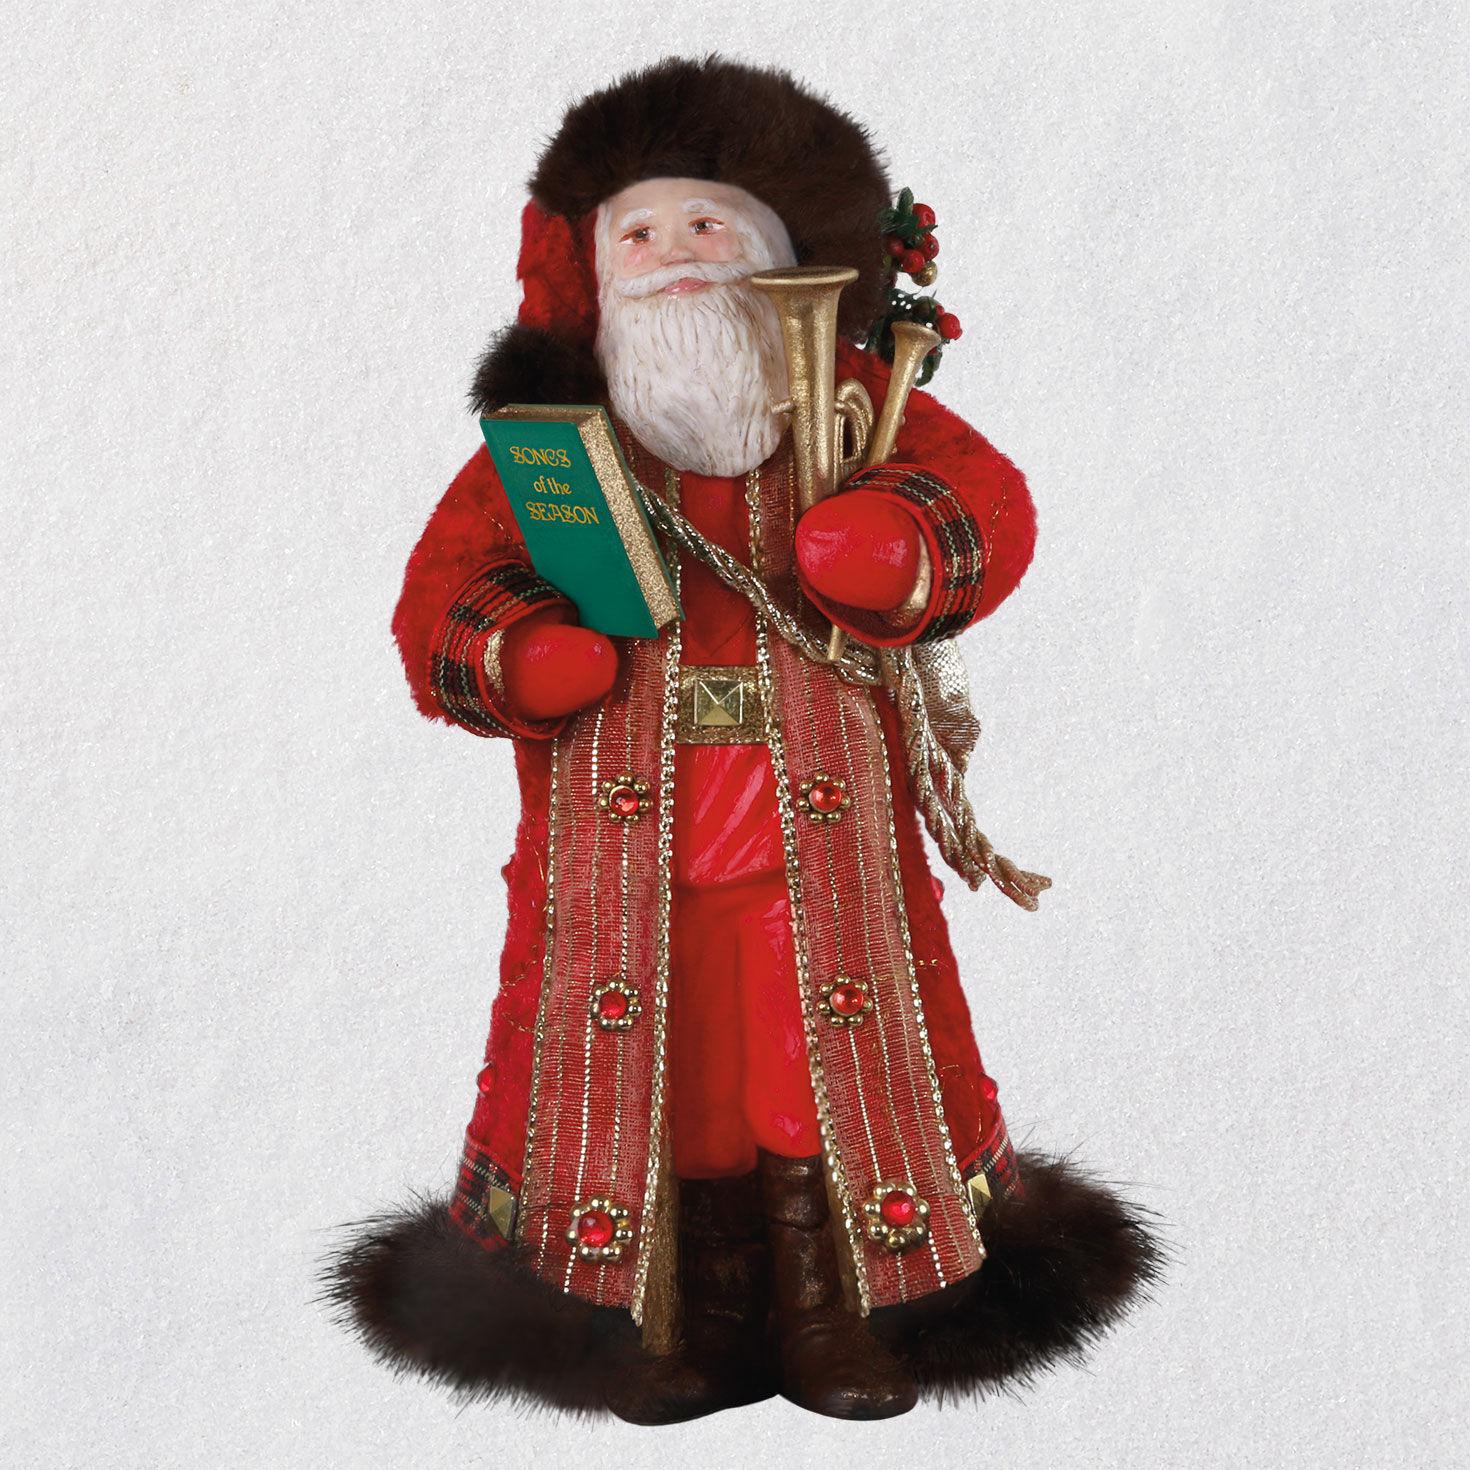 Father Christmas Ornament   Keepsake Ornaments   Hallmark